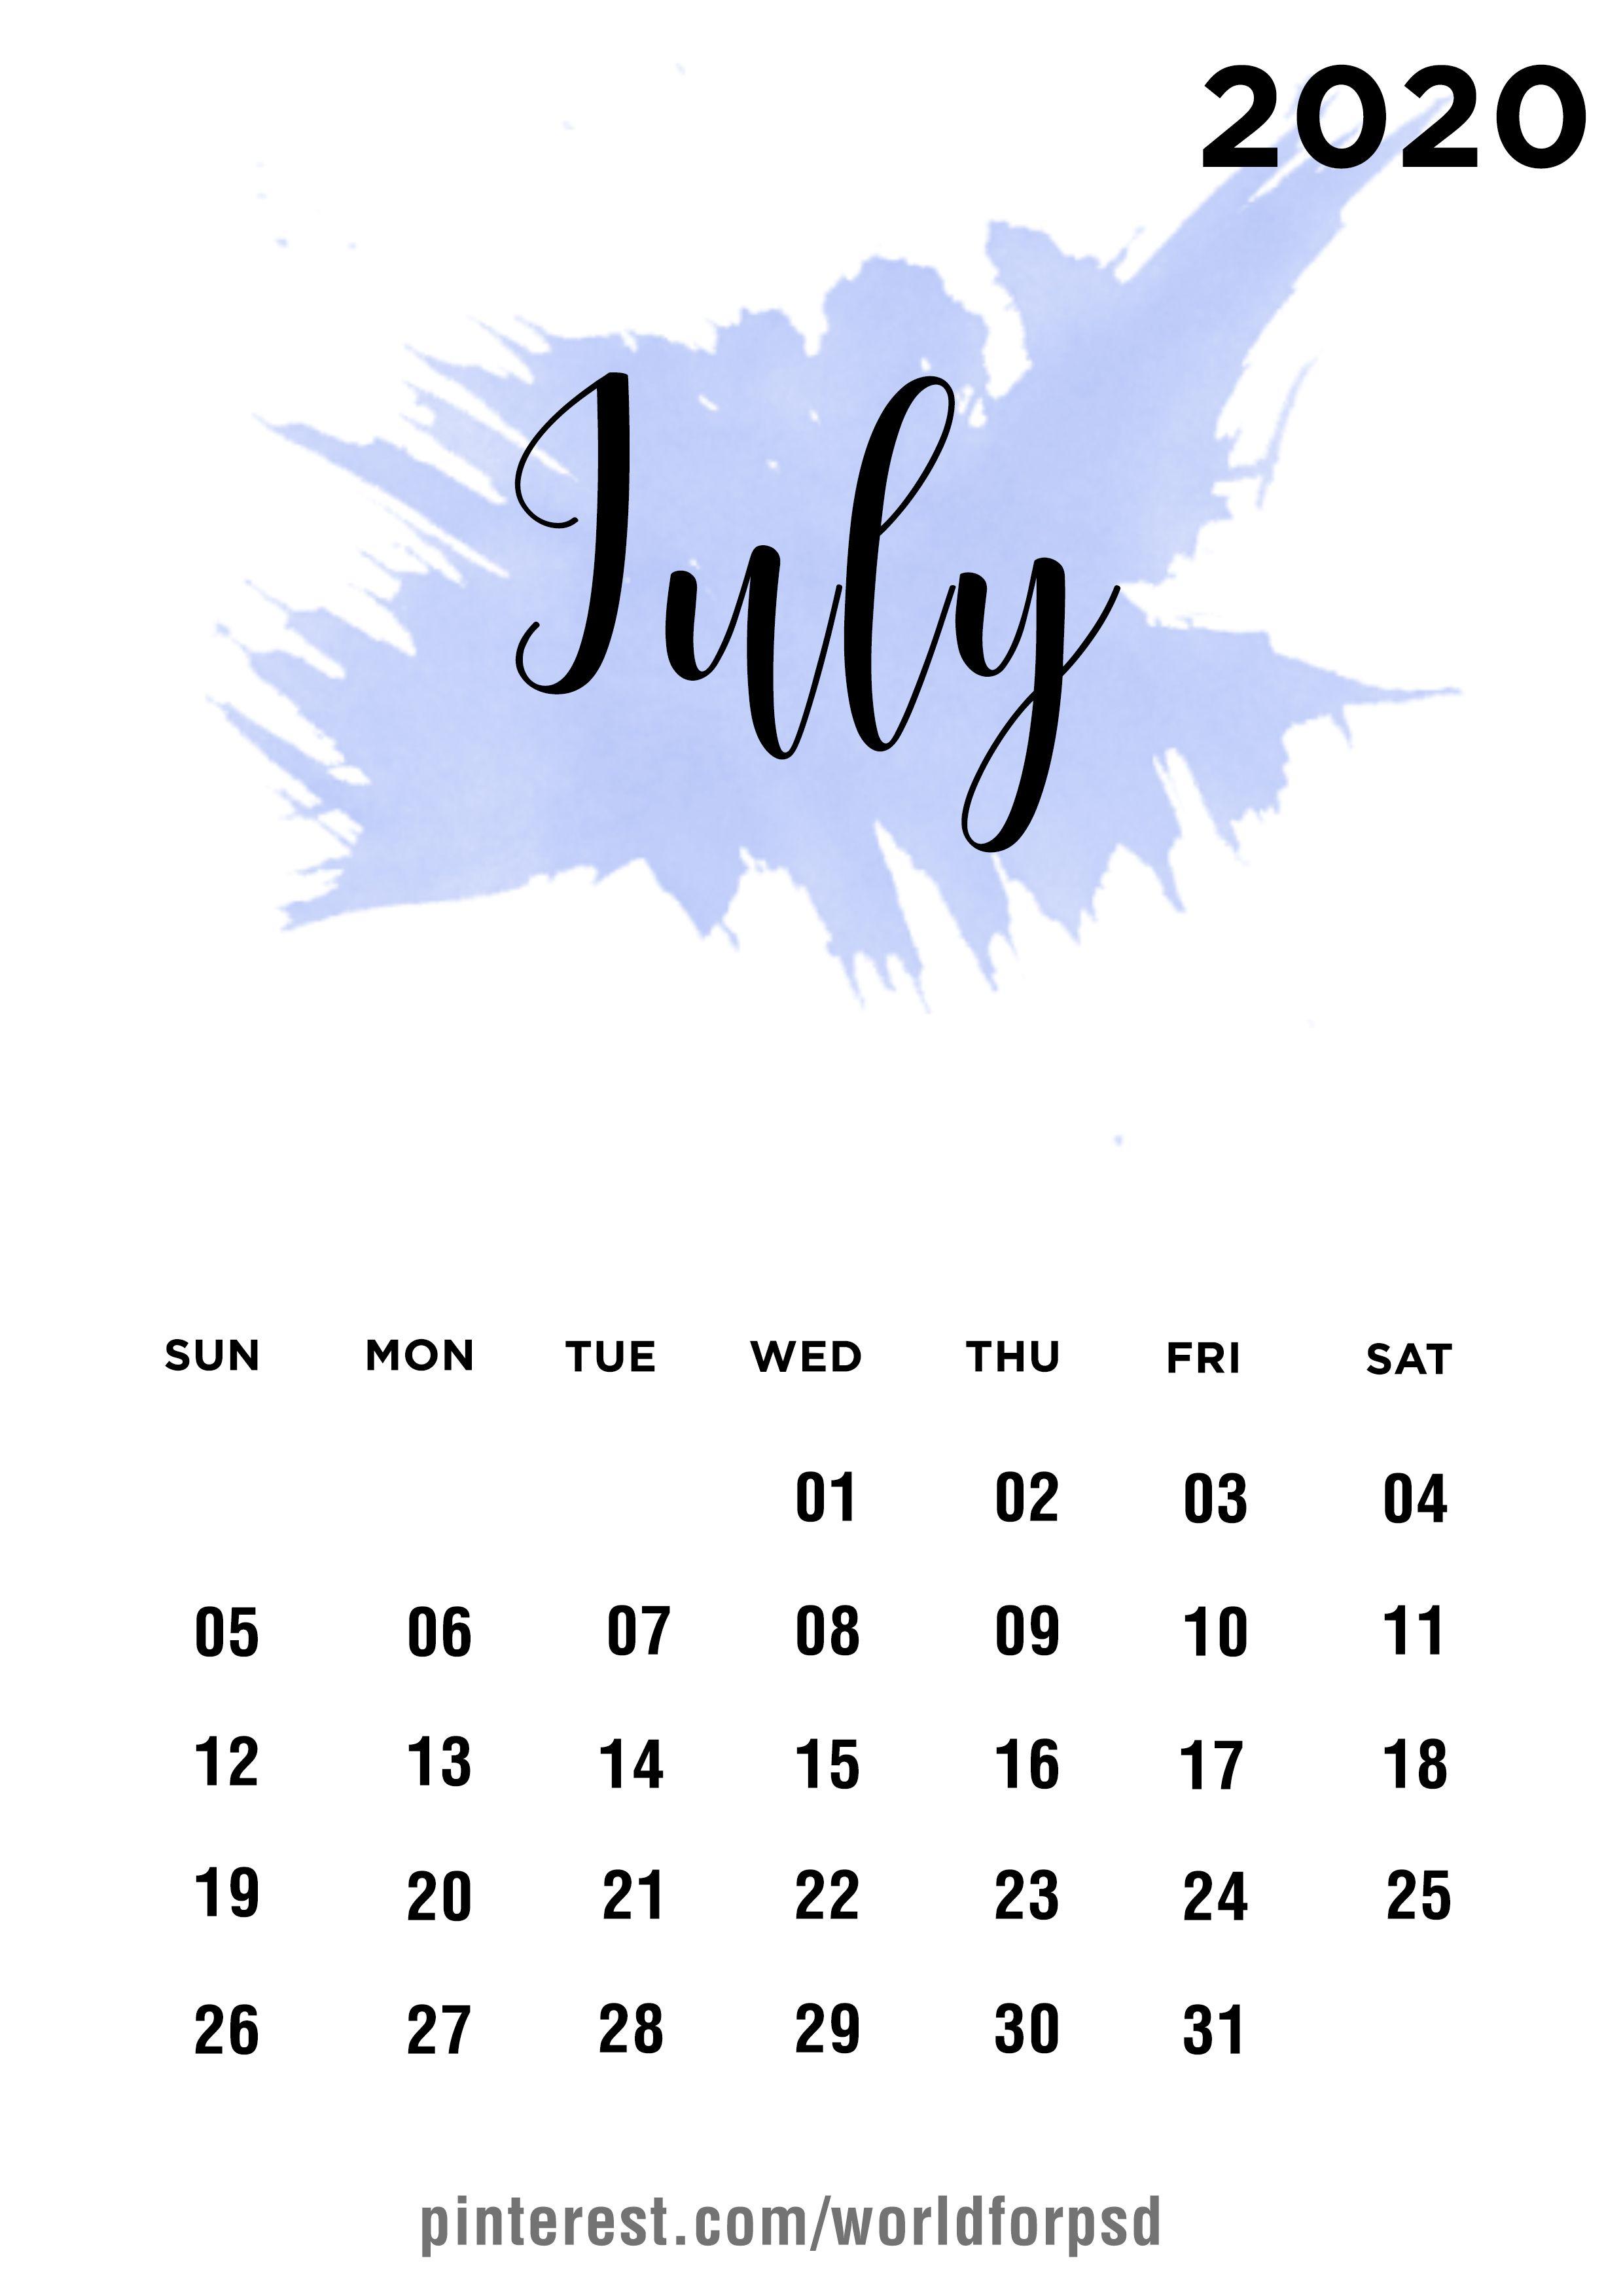 July 2020 Calendar Design calendar calendarideas